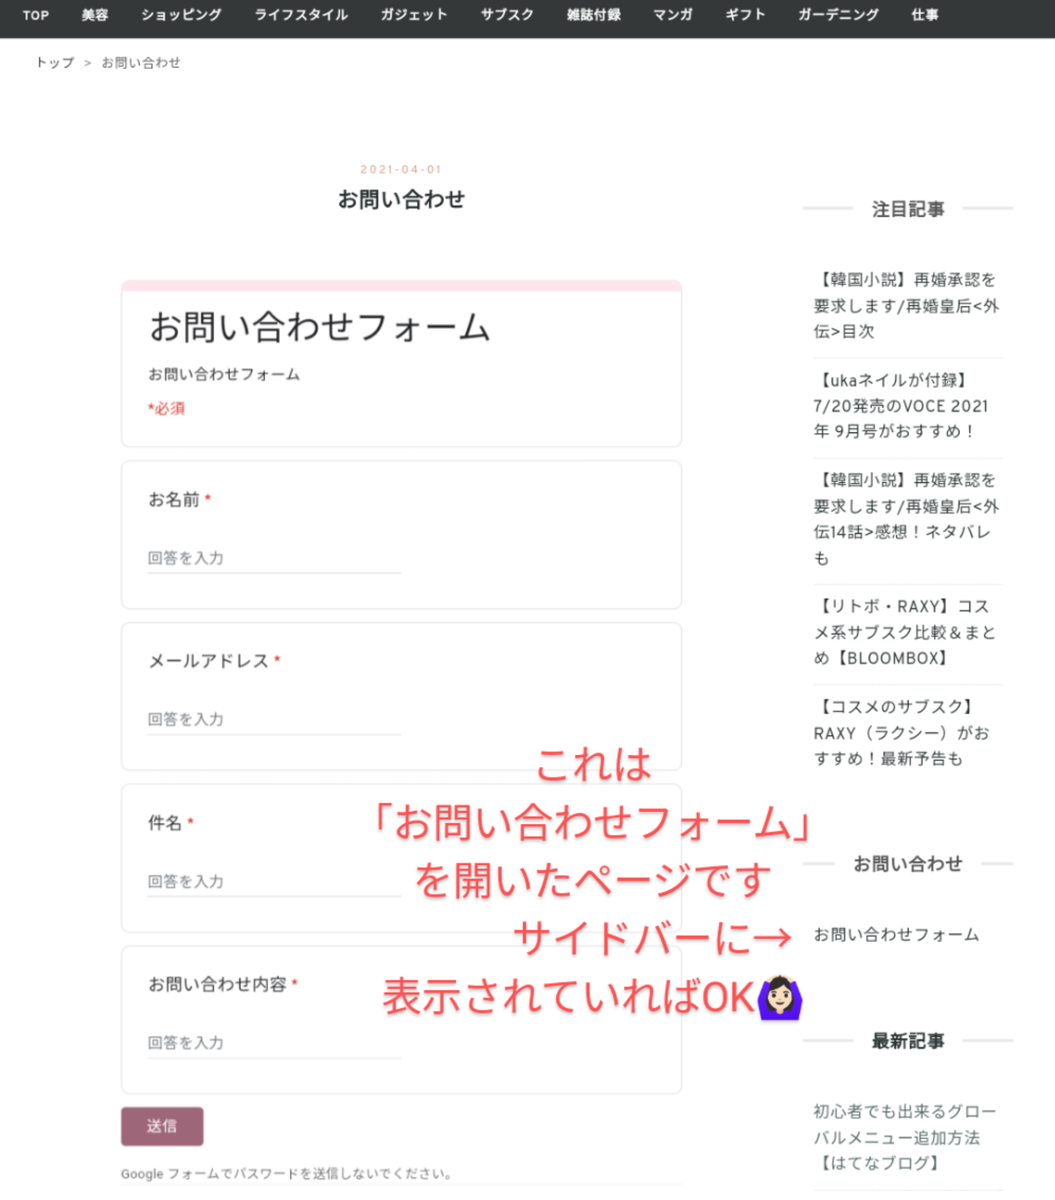 f:id:otoku-otaku:20210623222432p:plain